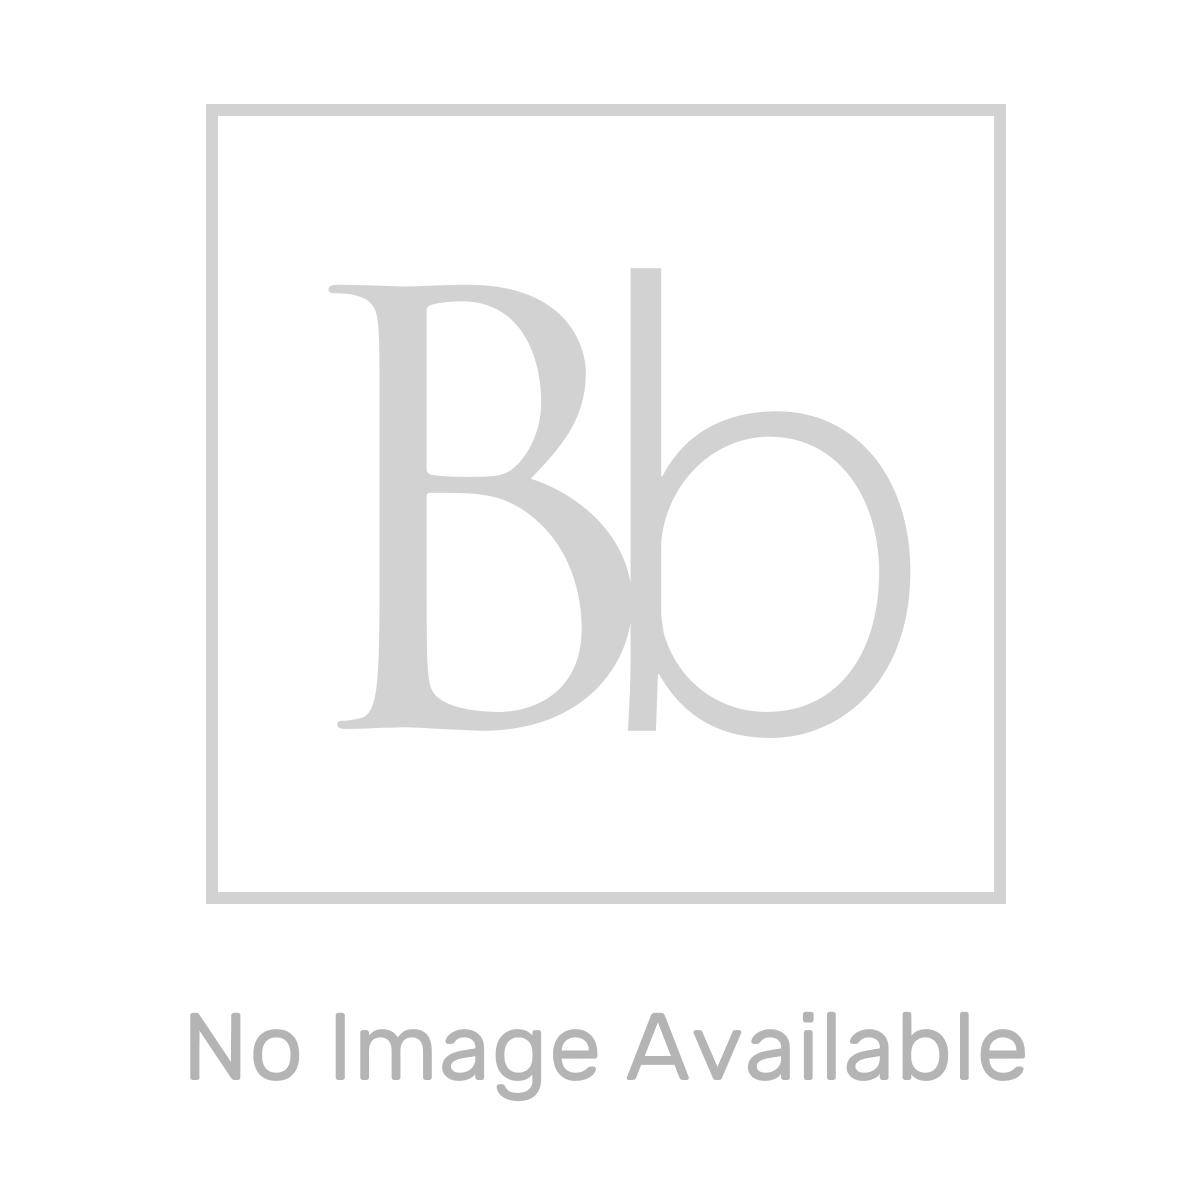 Elation Combination Straight Bodega Grey Furniture Pack 1000mm Dimensions